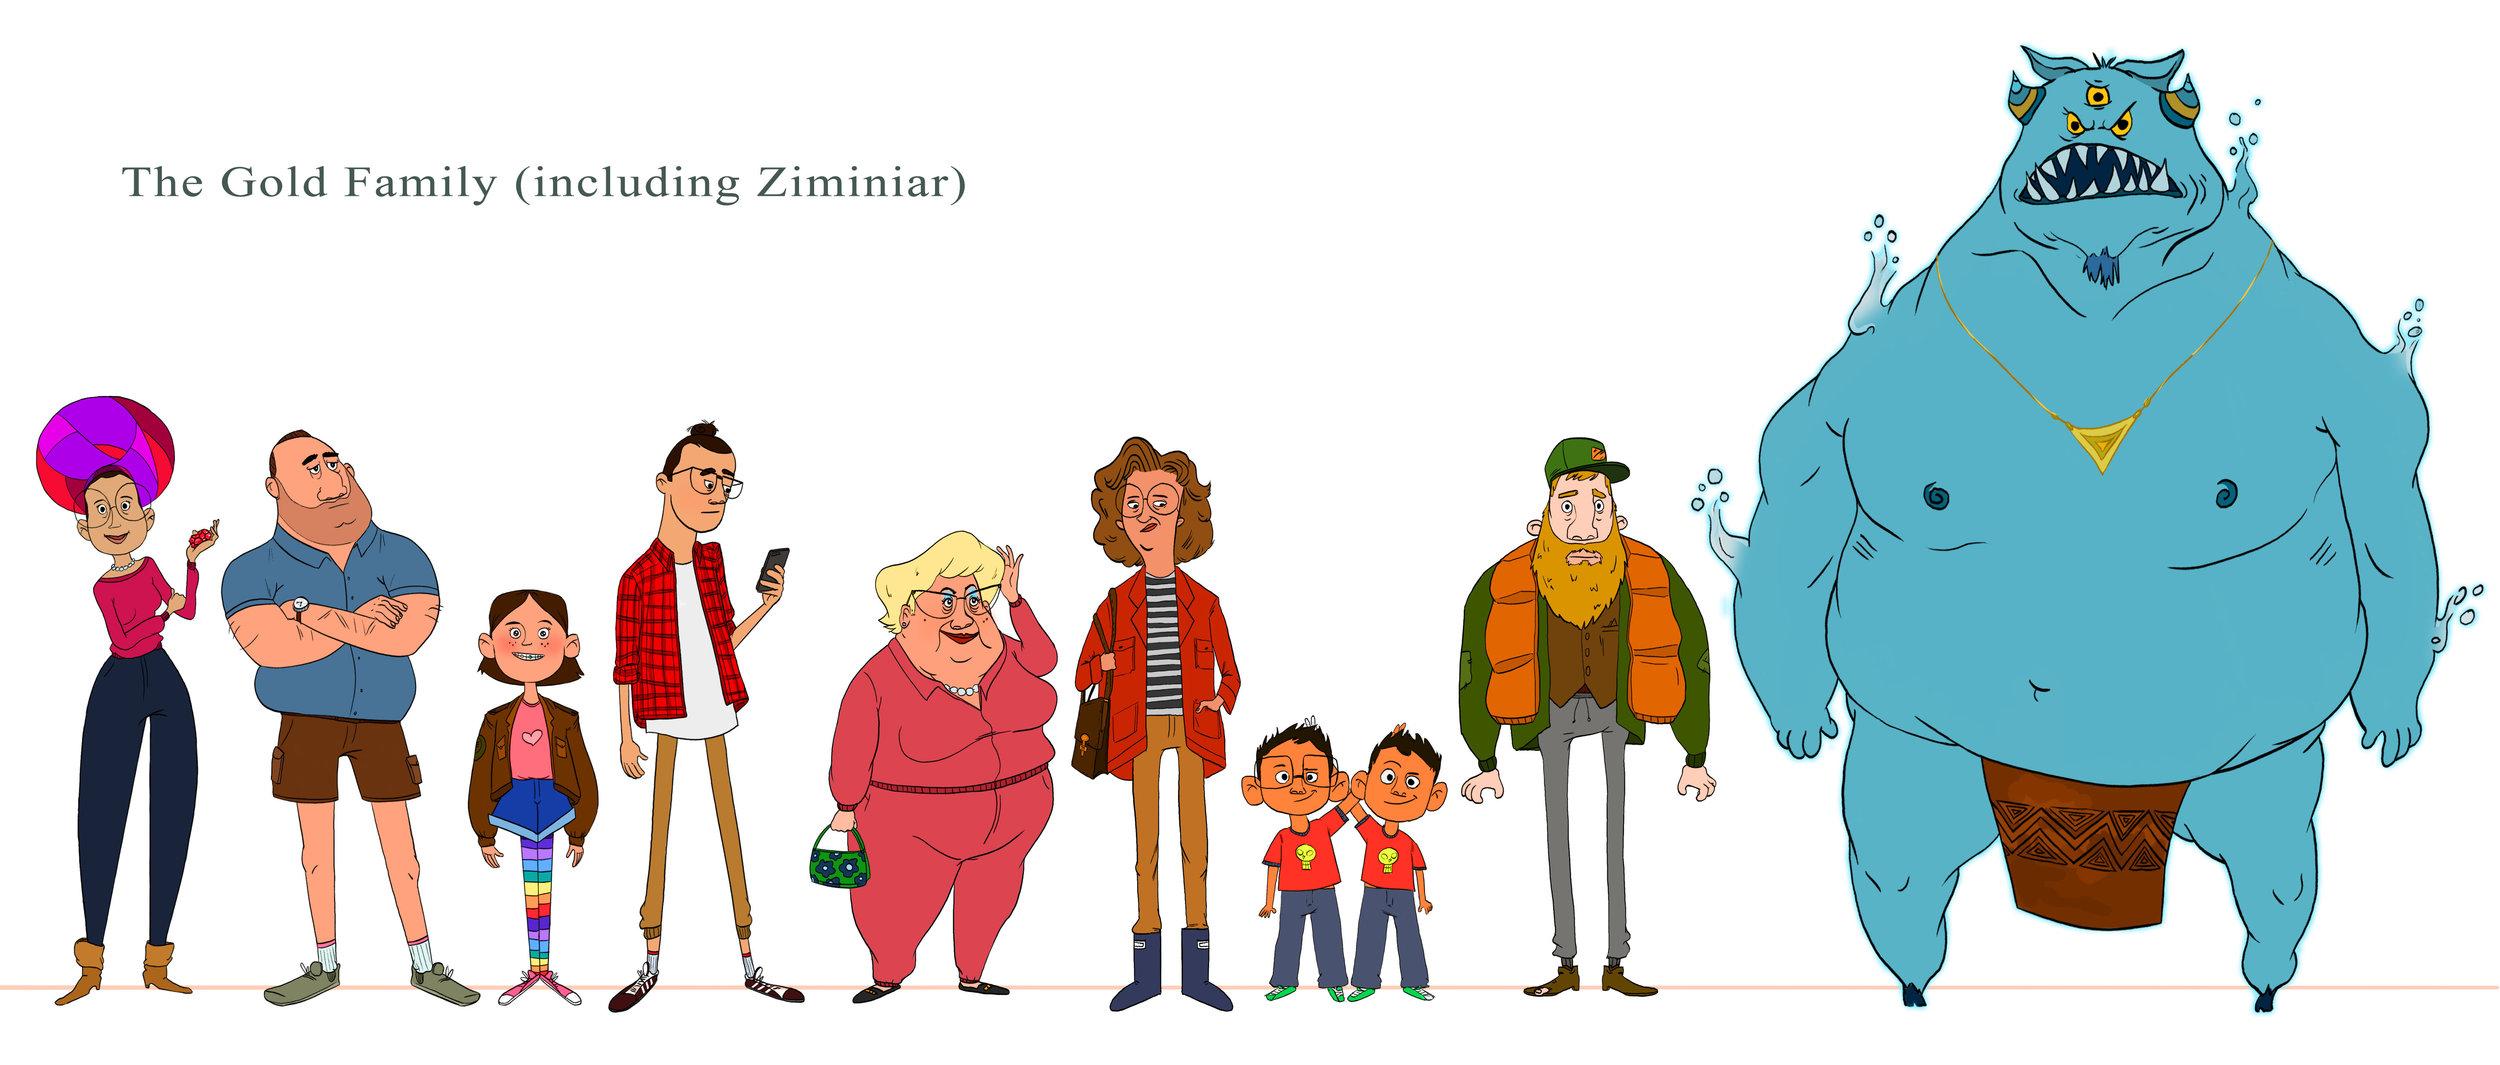 character designs.jpg